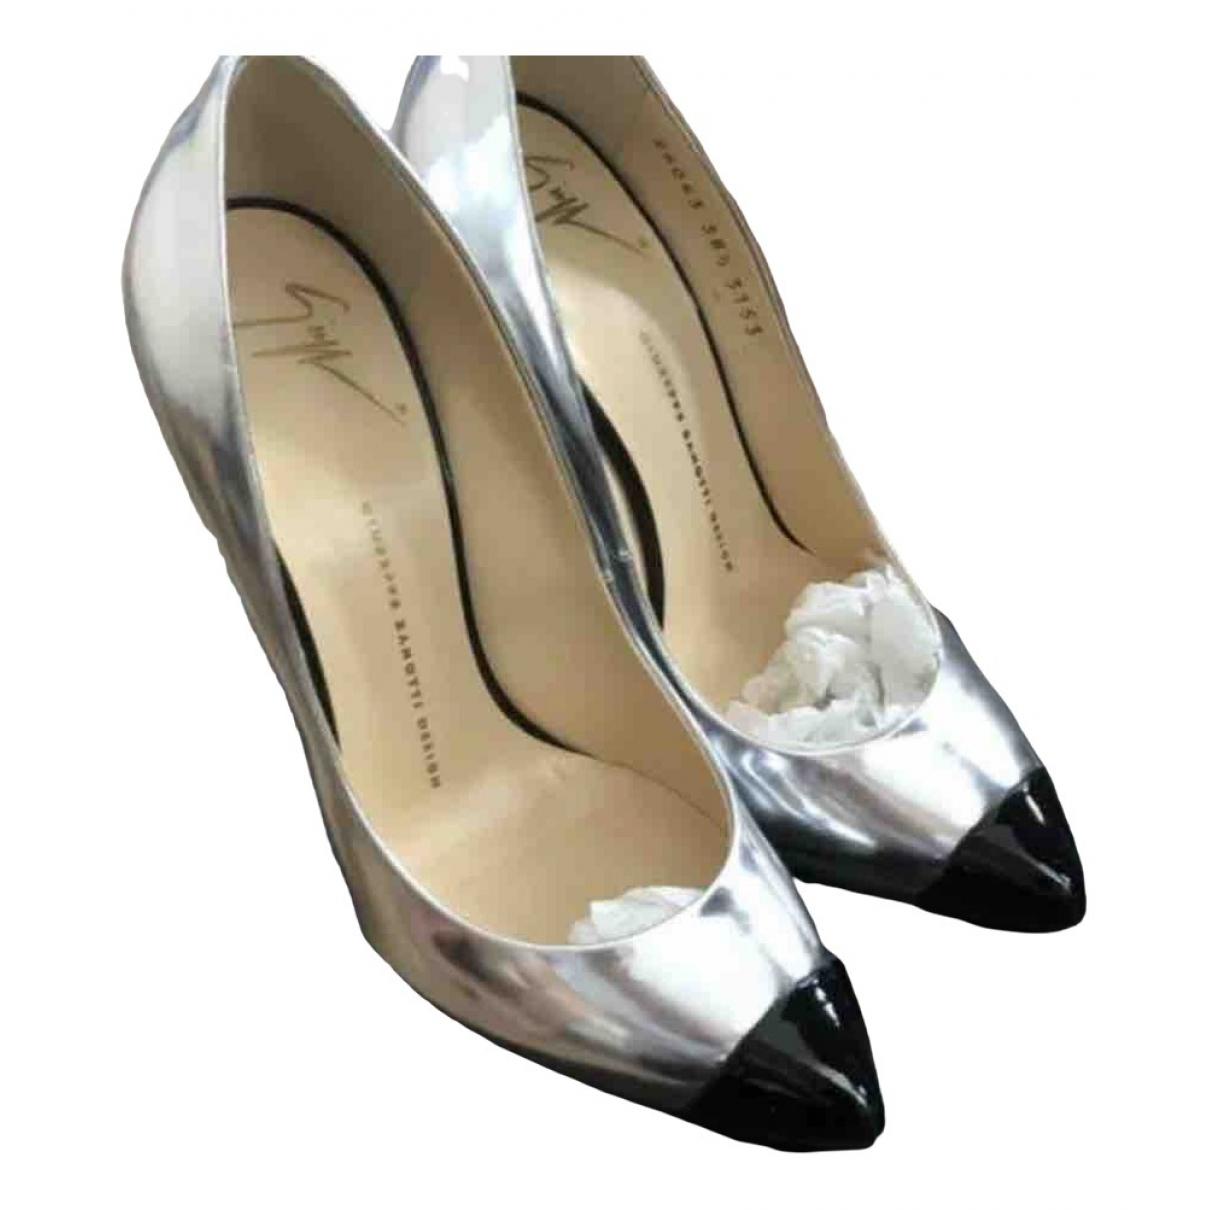 Giuseppe Zanotti \N Metallic Patent leather Heels for Women 38.5 EU